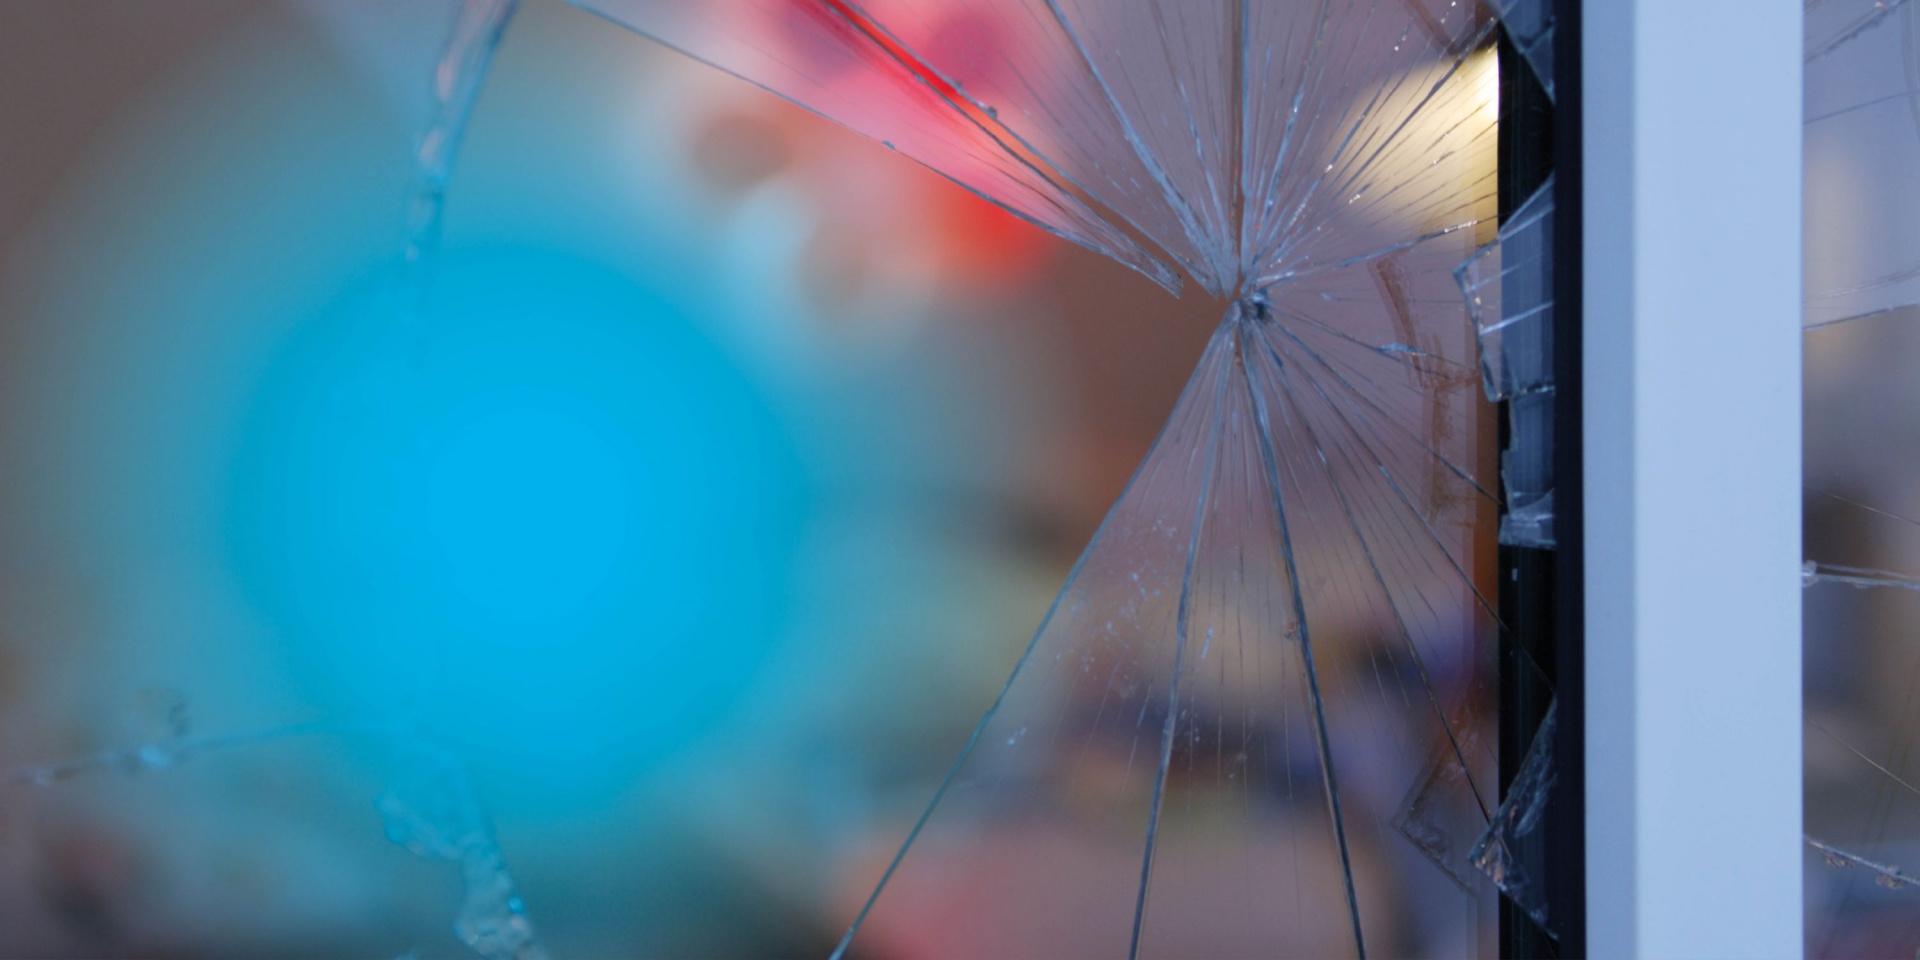 Glasschade blauw_ronduit.jpg